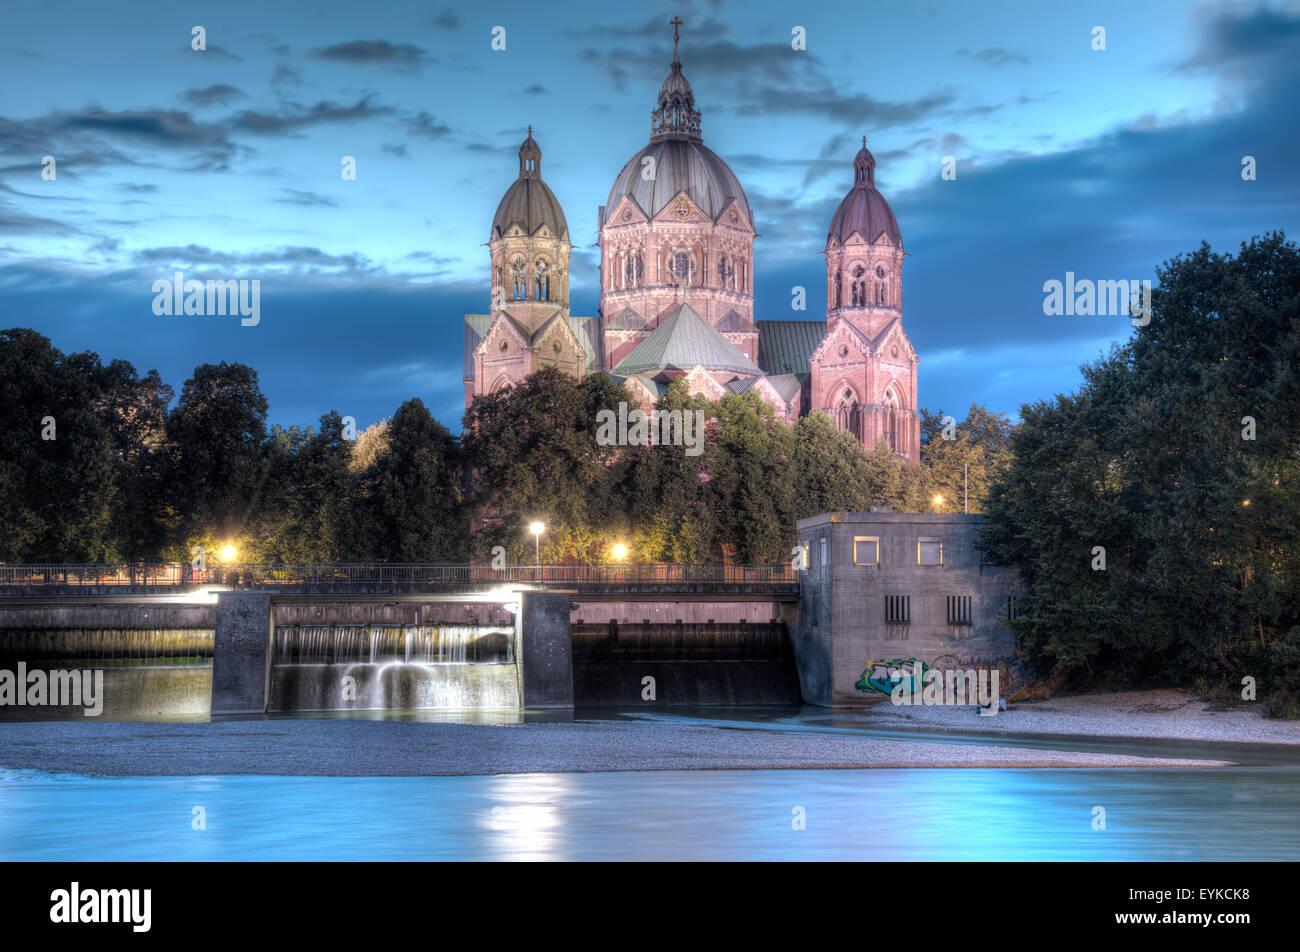 St Luke's Church in Munch at night, alongside the River Isar. Stock Photo